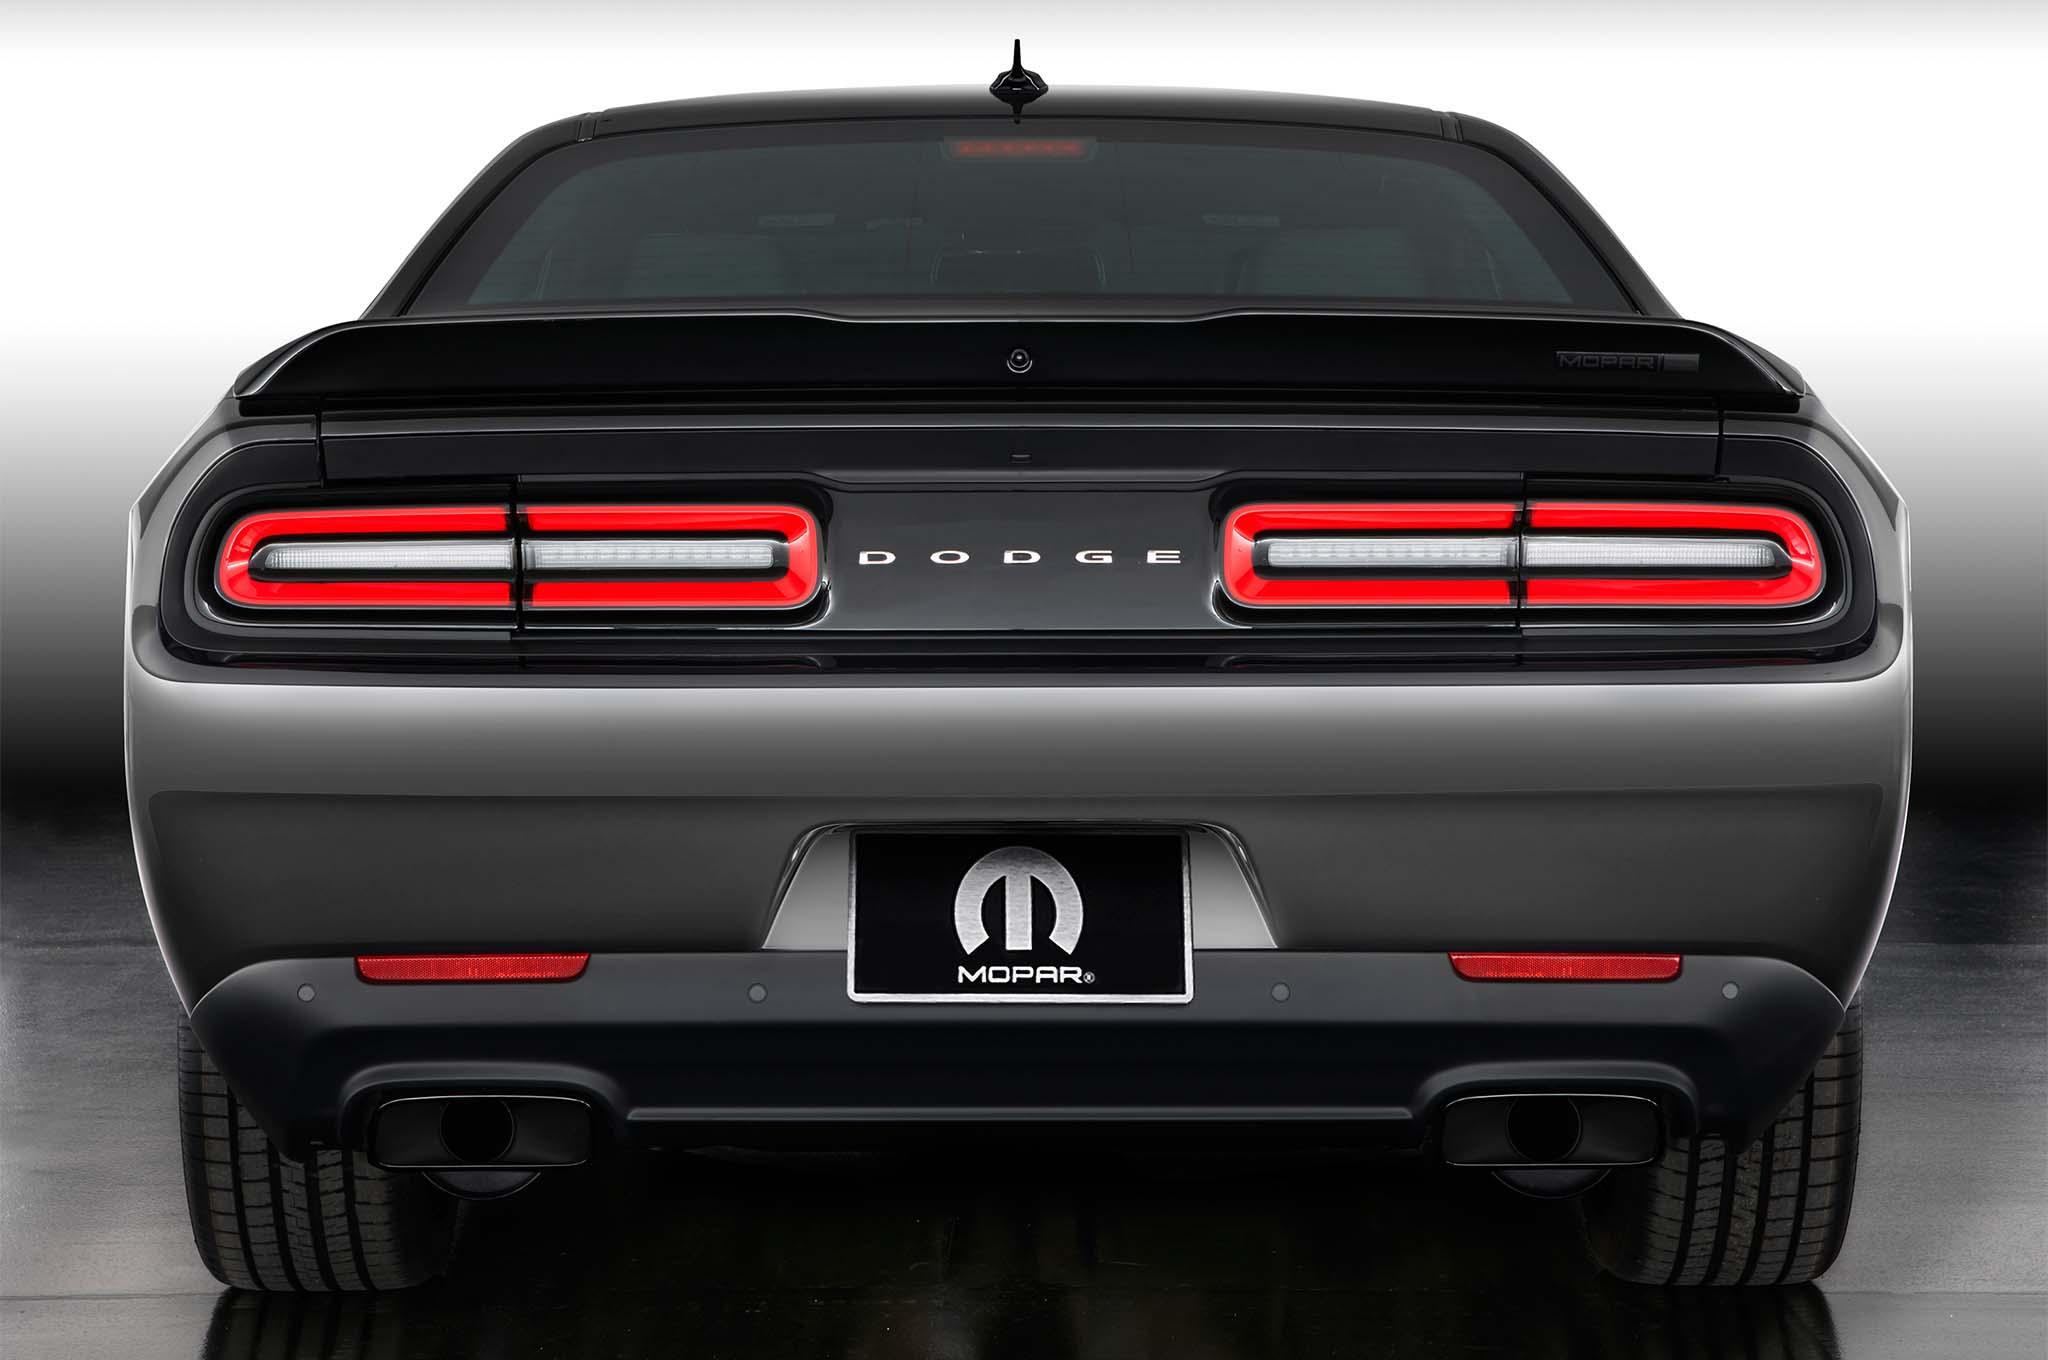 The rear decklid spoiler of the Mopar '17 Dodge Challenger rec